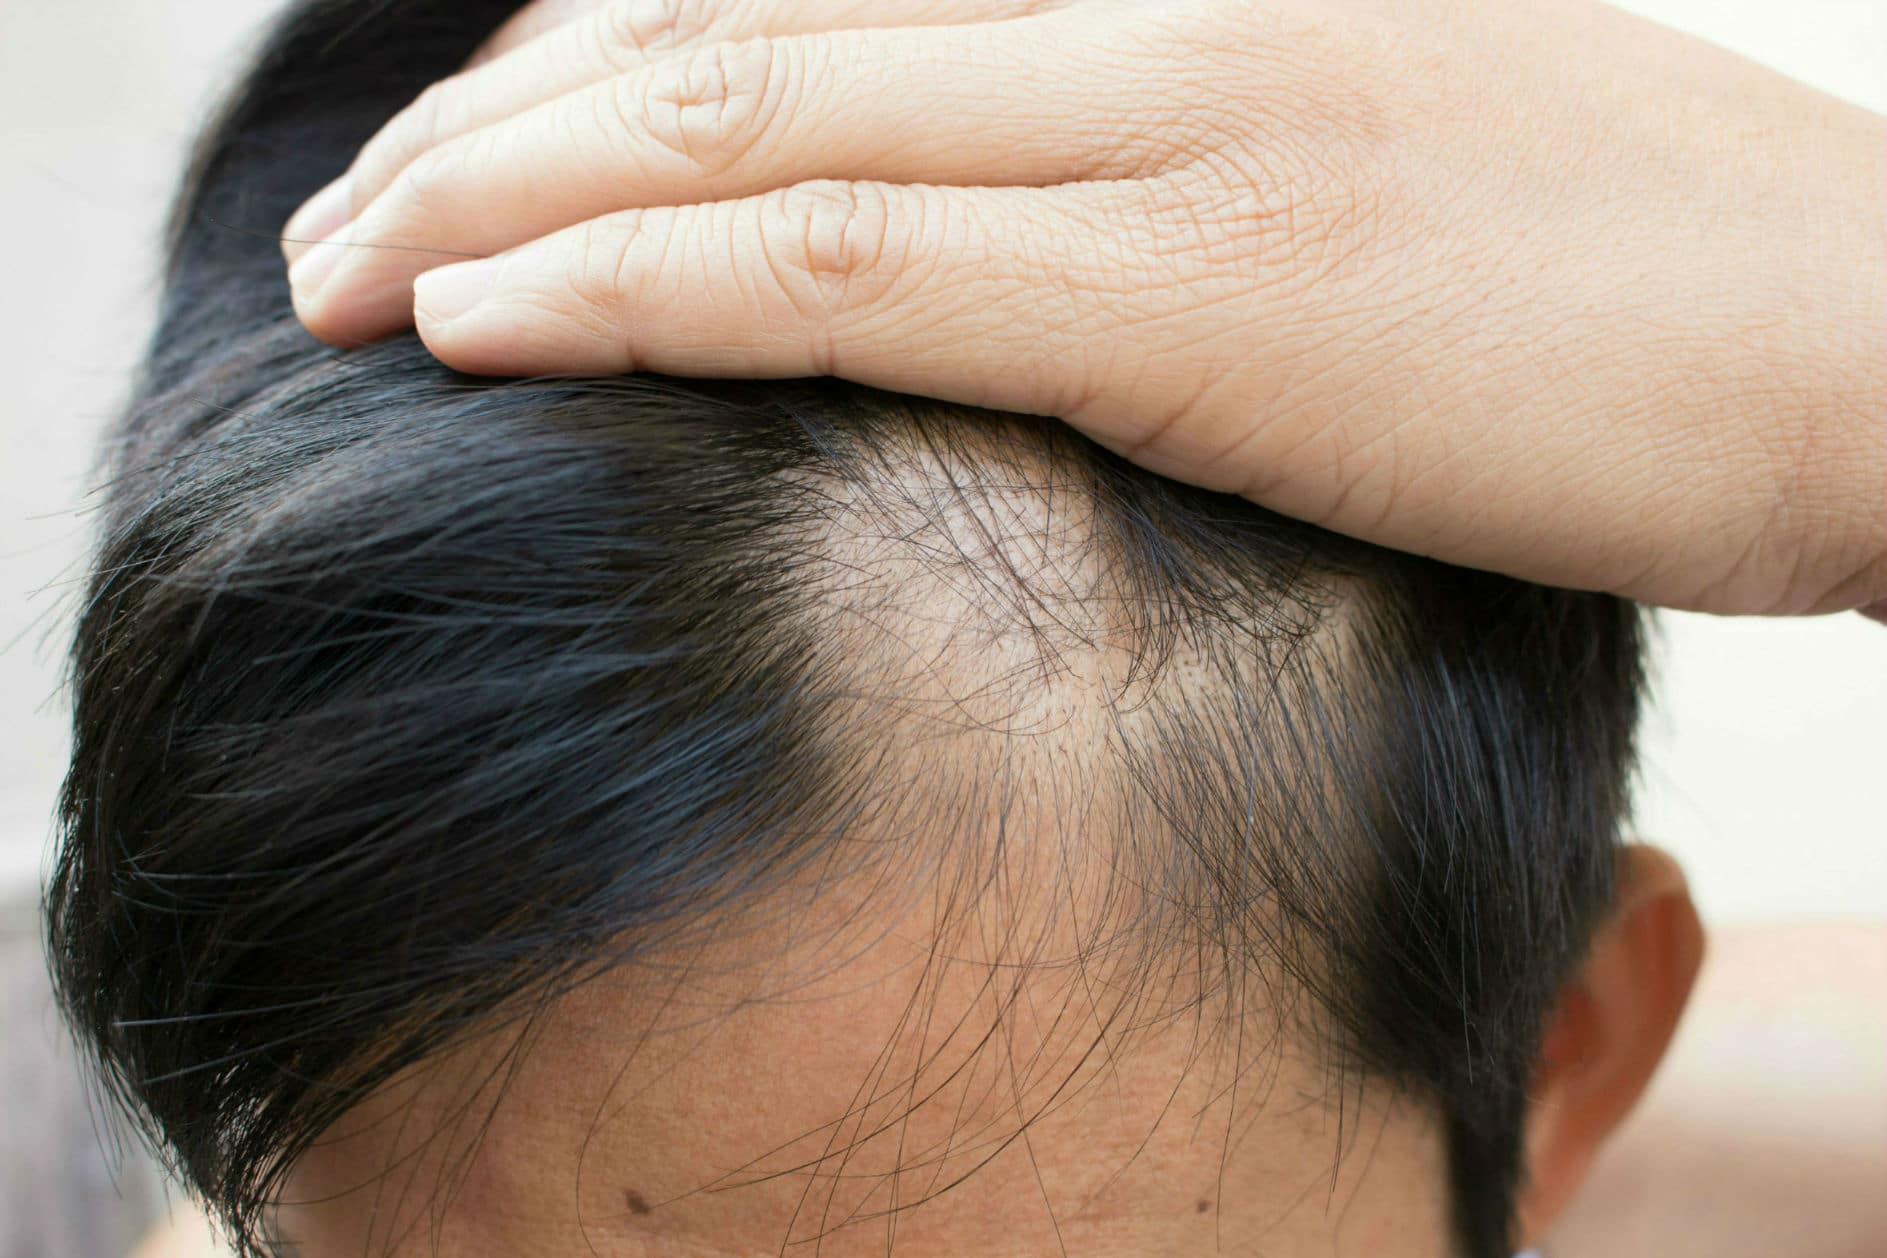 Oral Minoxidil Treatment Tablets For Hair Loss Alopecia